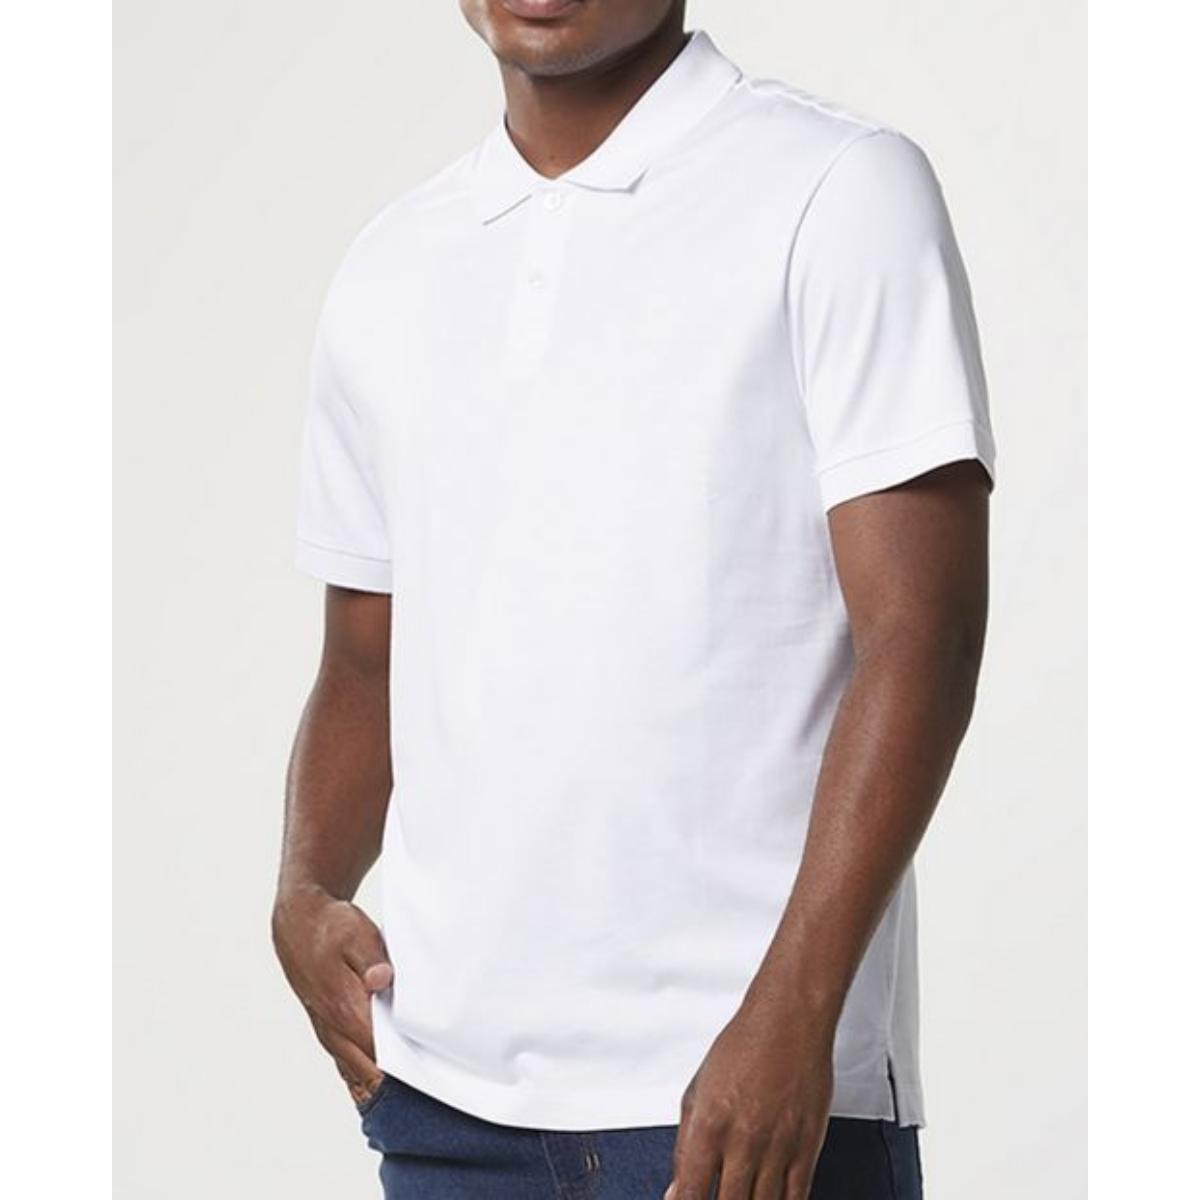 Camiseta Masculina Hering Kg2a N0asi Branco